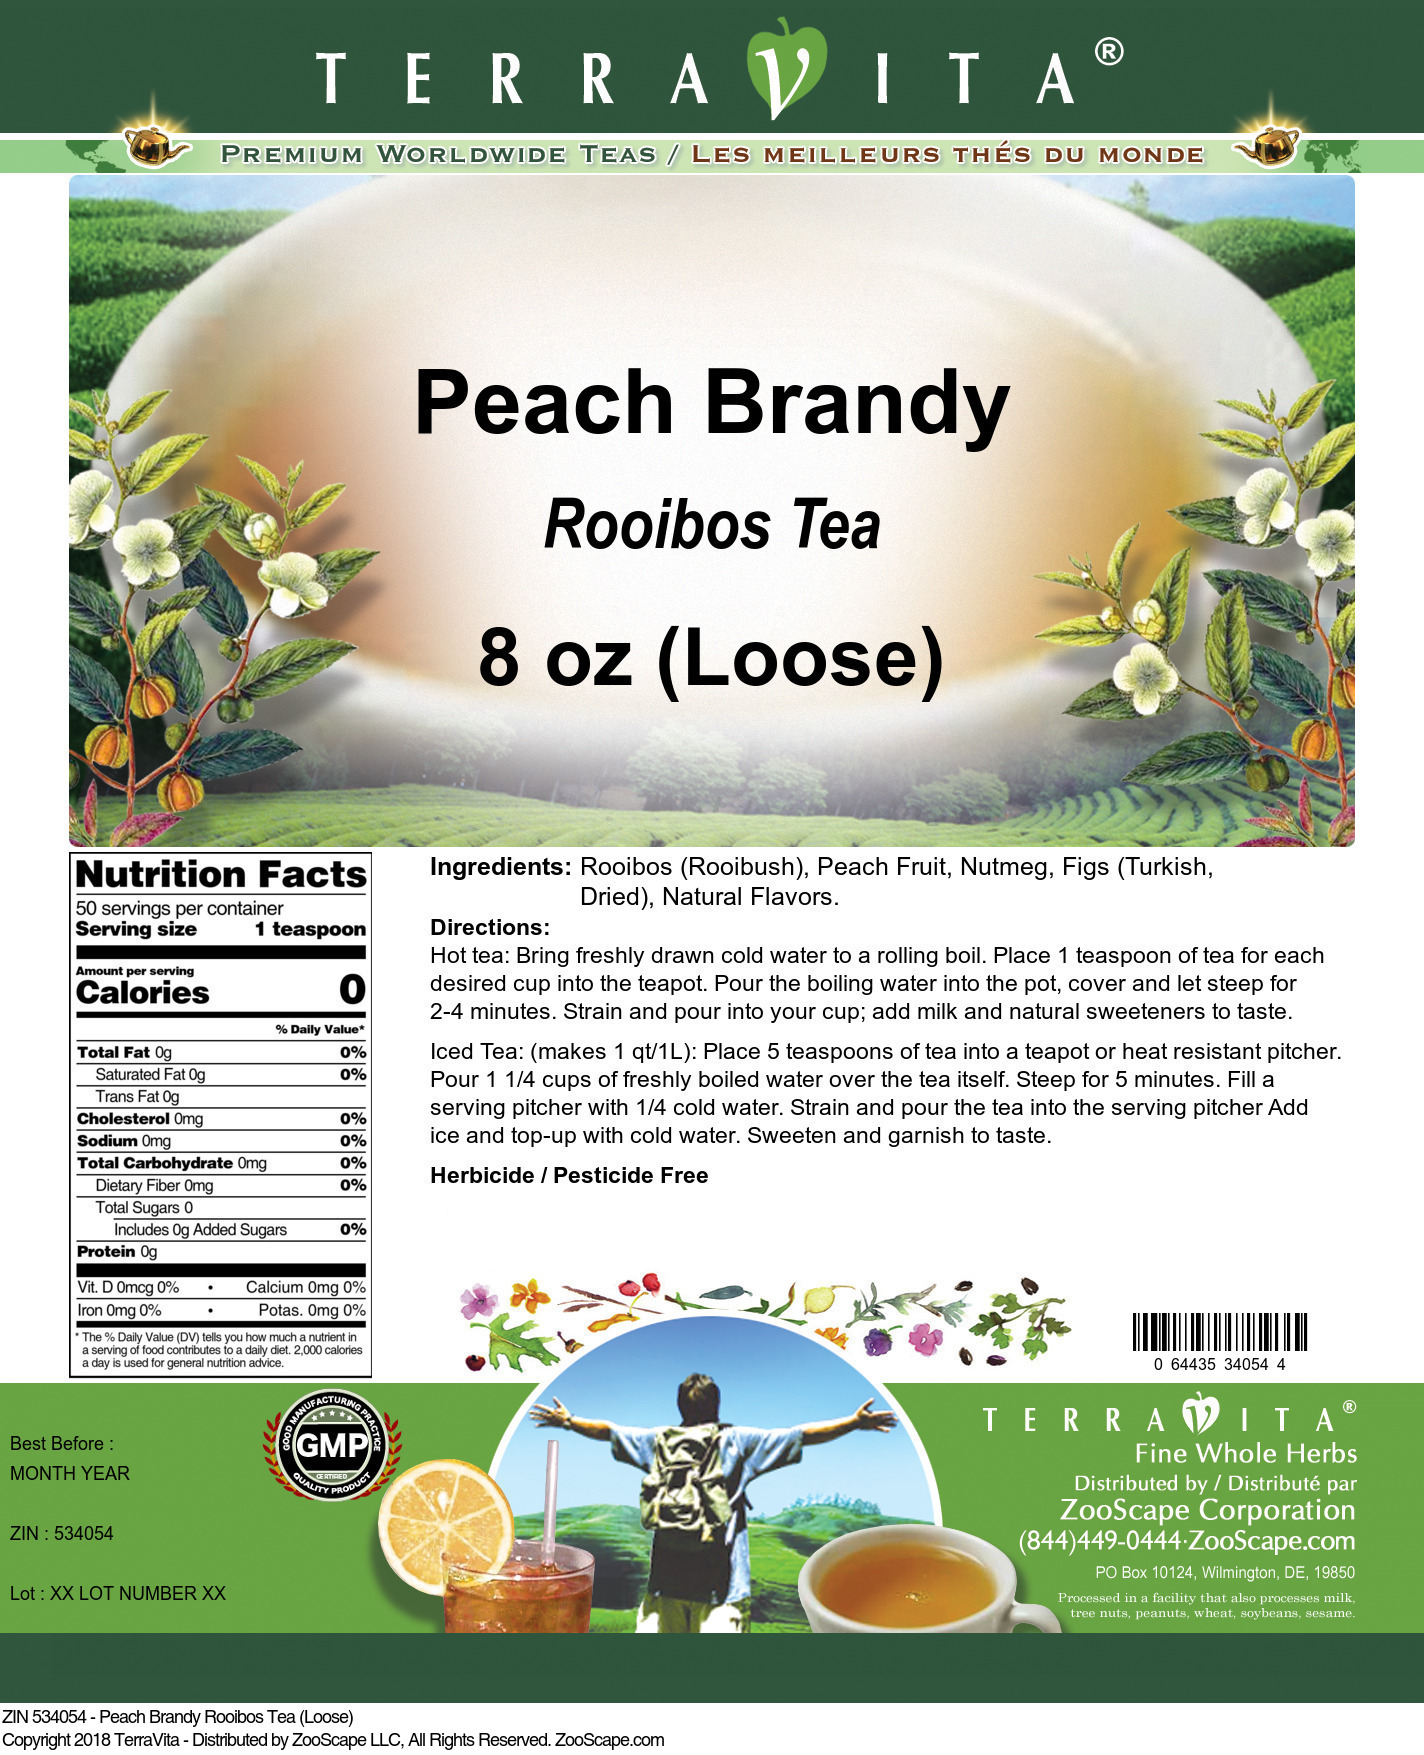 Peach Brandy Rooibos Tea (Loose)